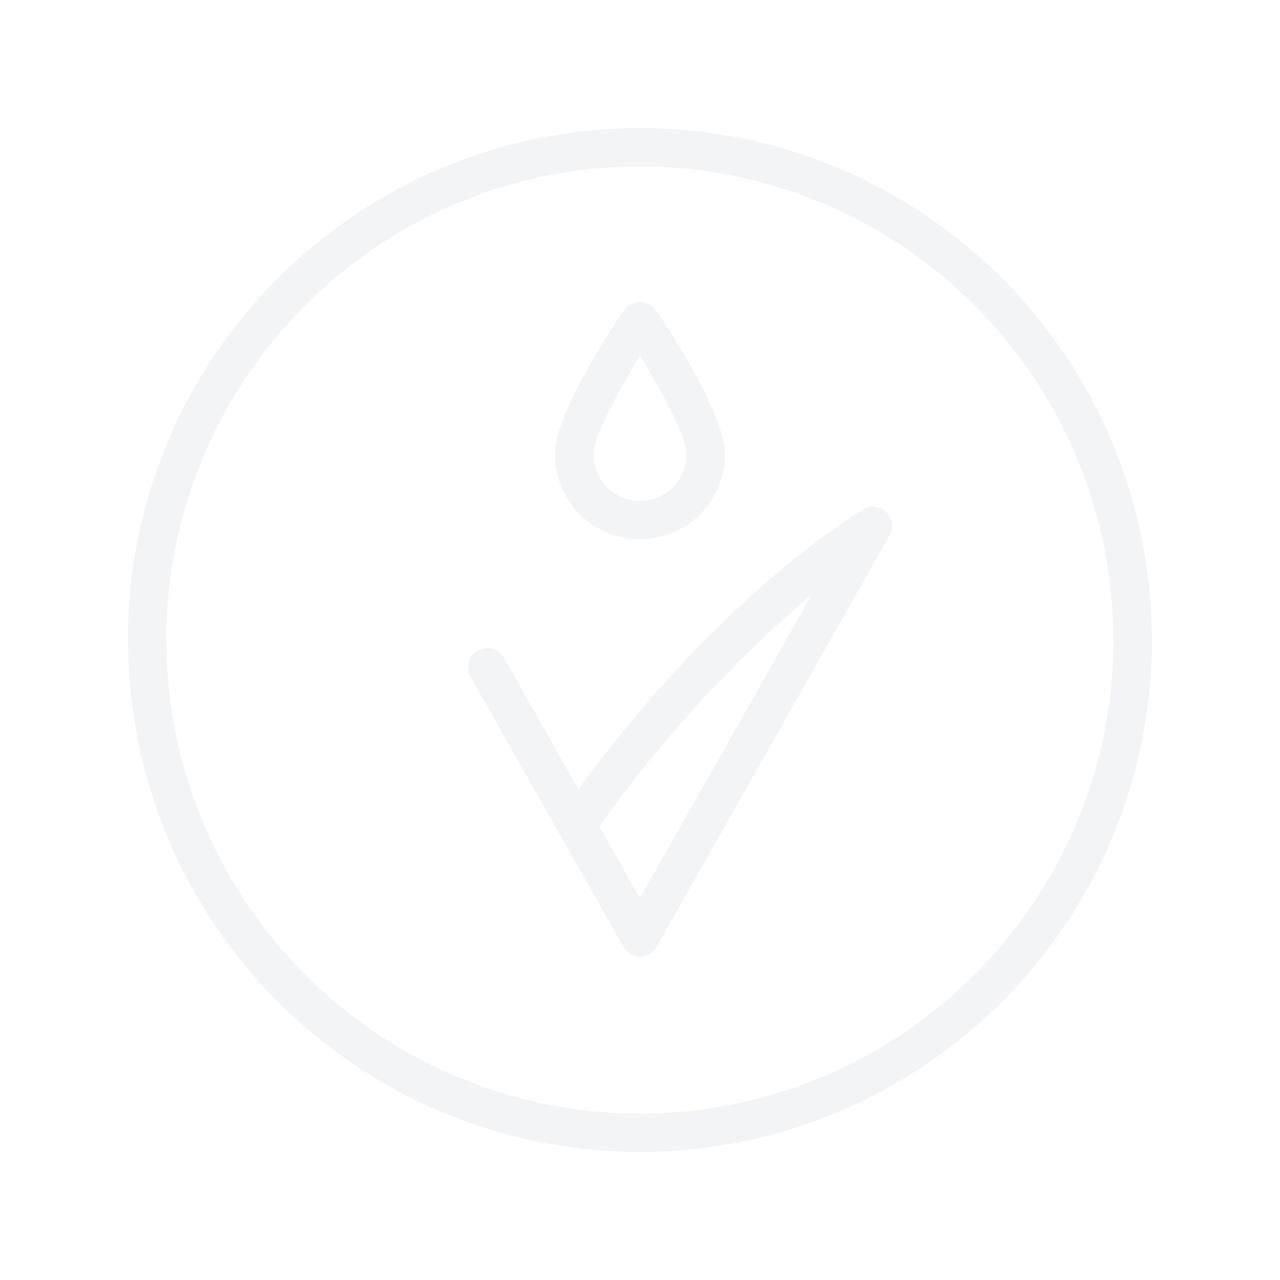 GOSH Stroben Glow Kit No.002 Blush 20g